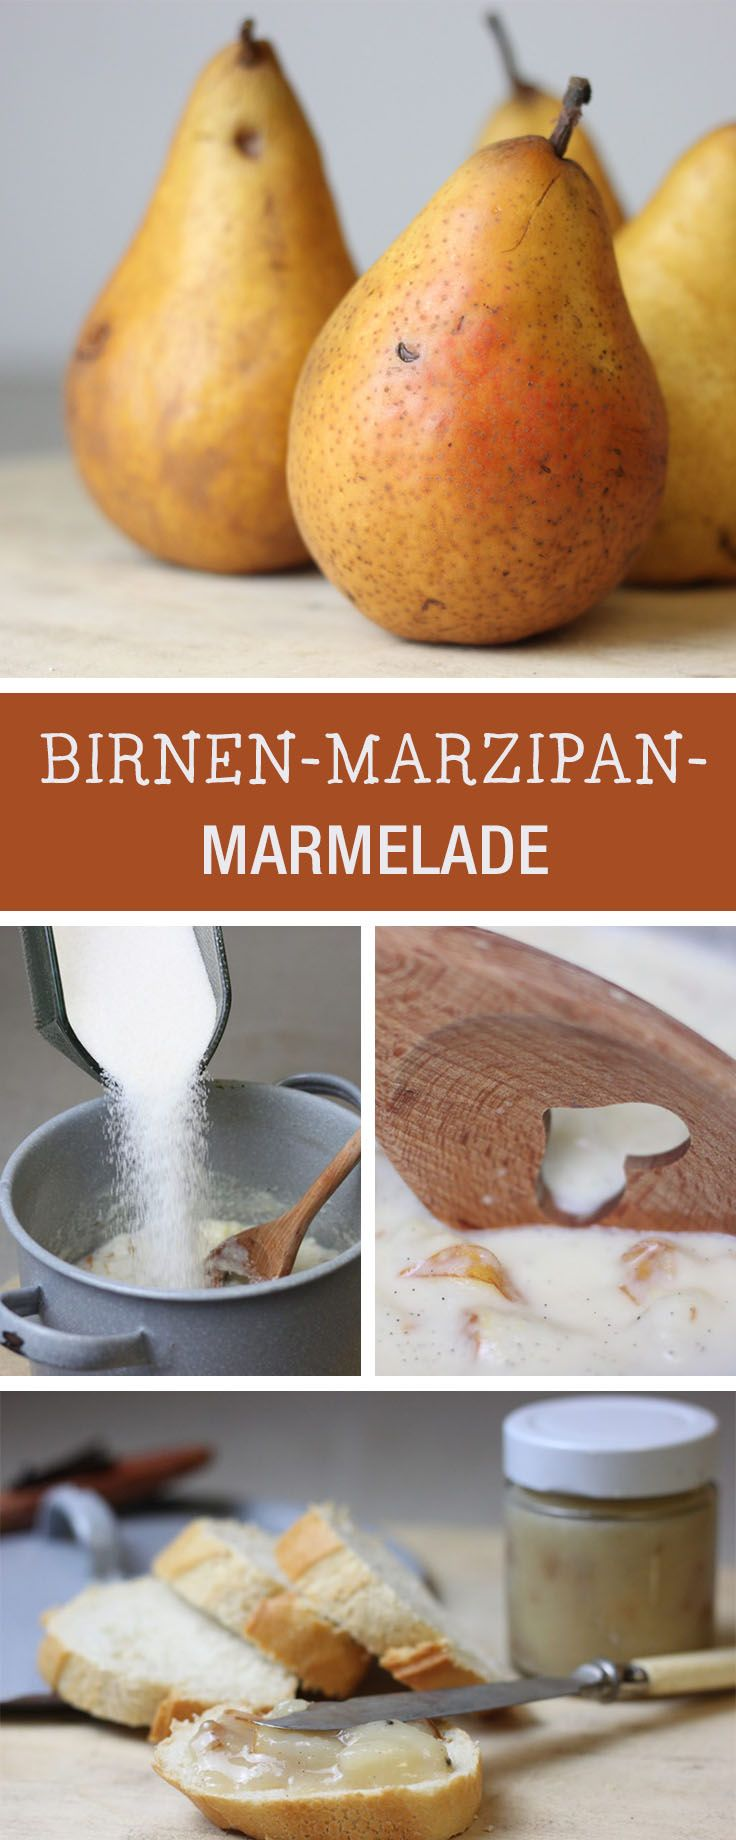 rezept birnen marzipan marmelade einkochen recipe for pear marzipan marmelade via. Black Bedroom Furniture Sets. Home Design Ideas